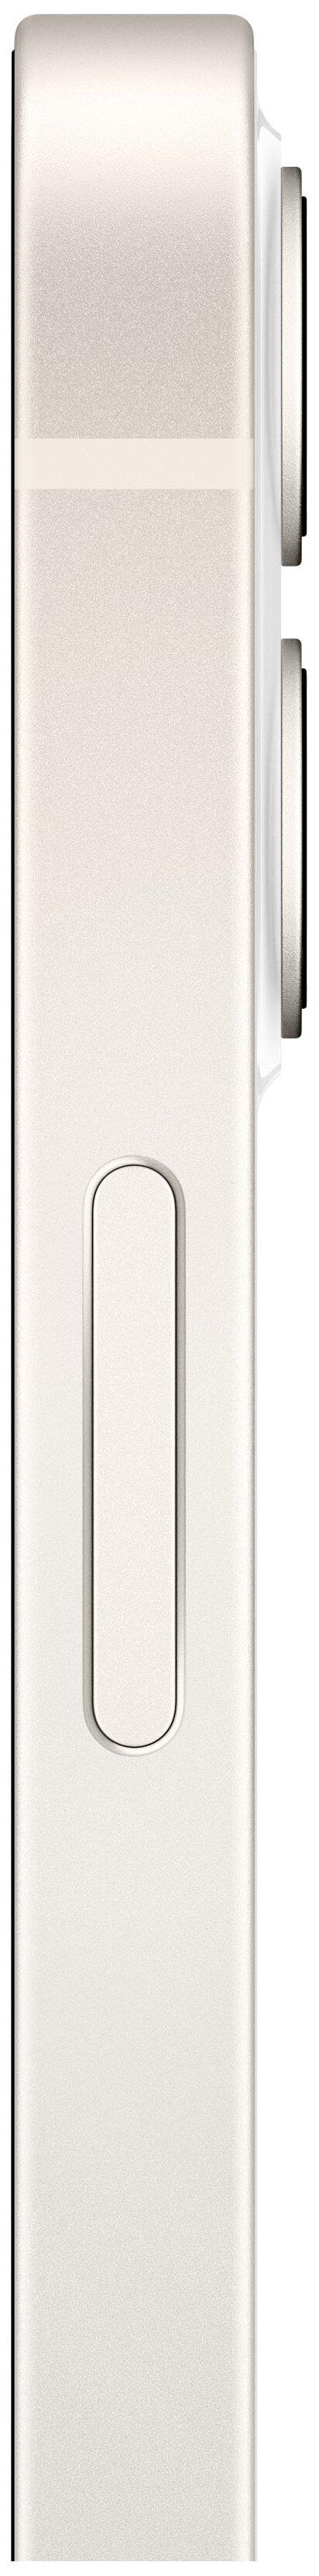 Apple iPhone 12 mini 128GB - процессор: Apple A14Bionic